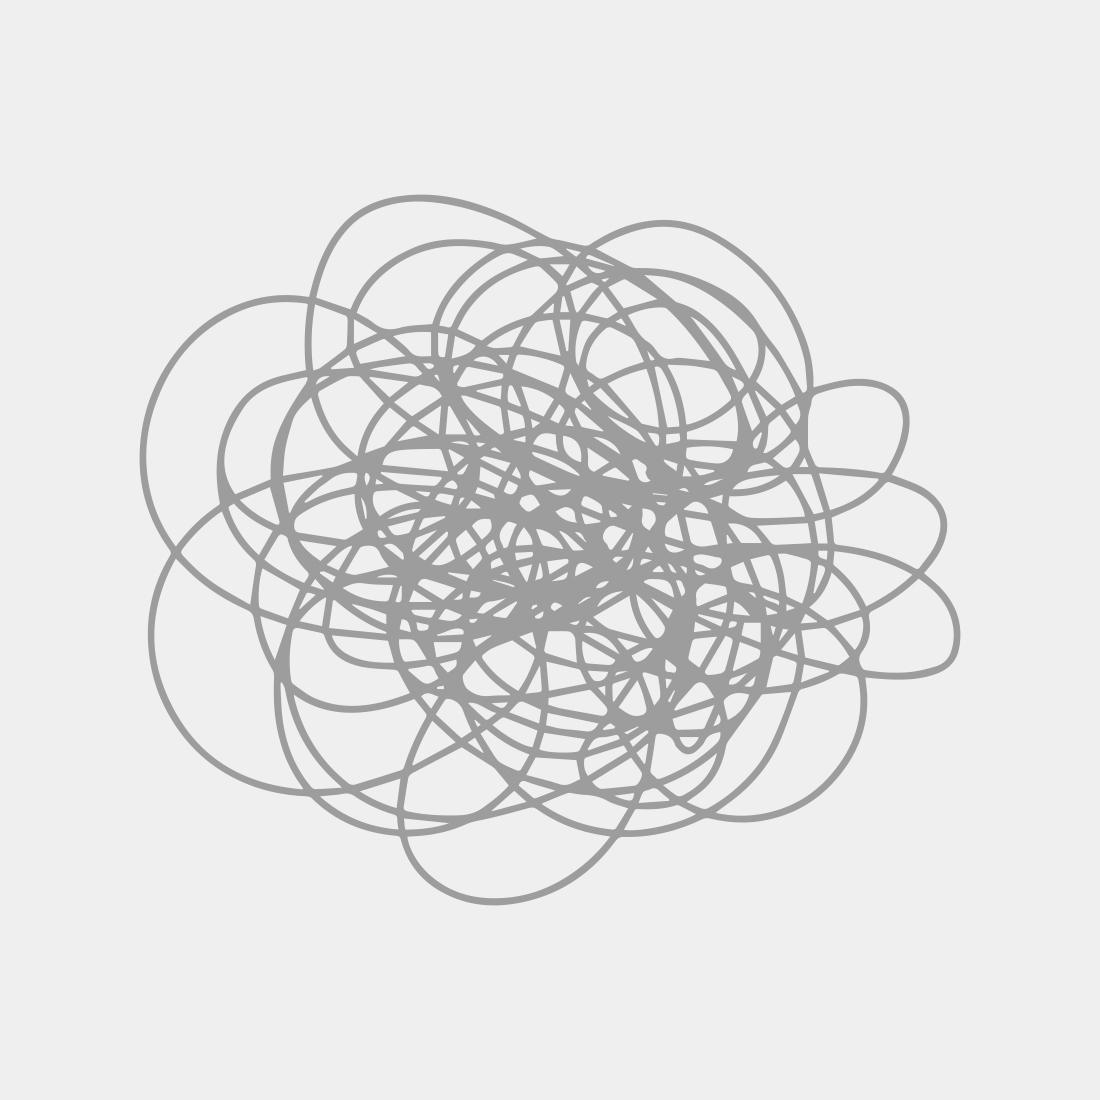 Albert Irvin OBE RA Untitled opus w.7 (framed)